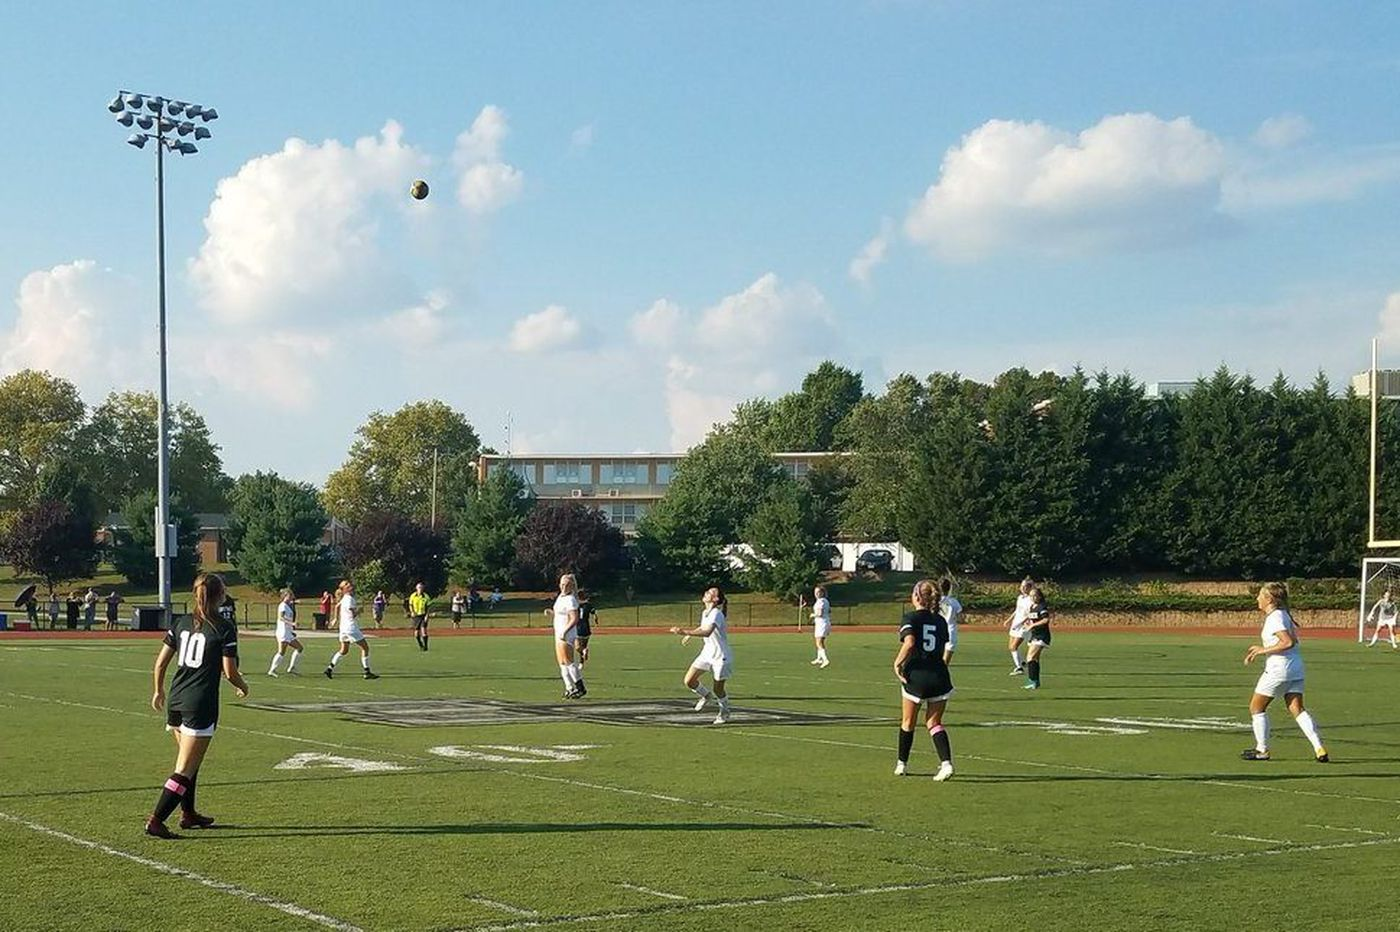 Thursday's South Jersey roundup: Seneca boys' soccer pulls away against Bishop Eustace